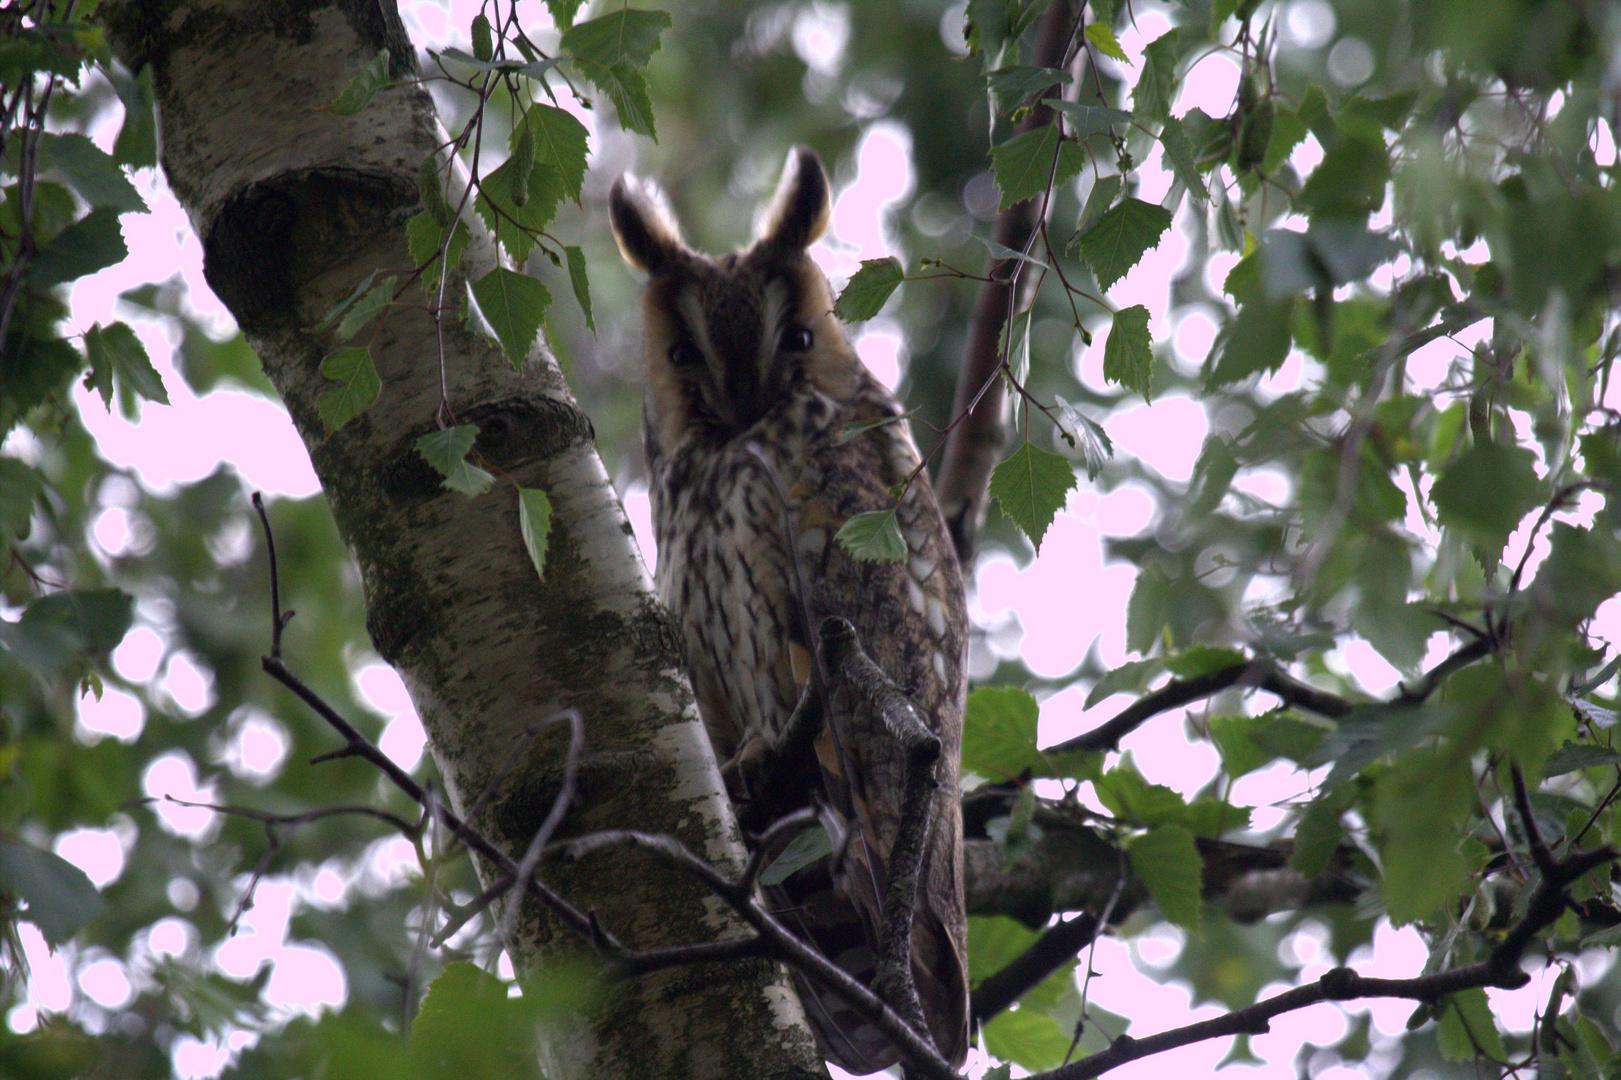 Waldohreule in einer Birke